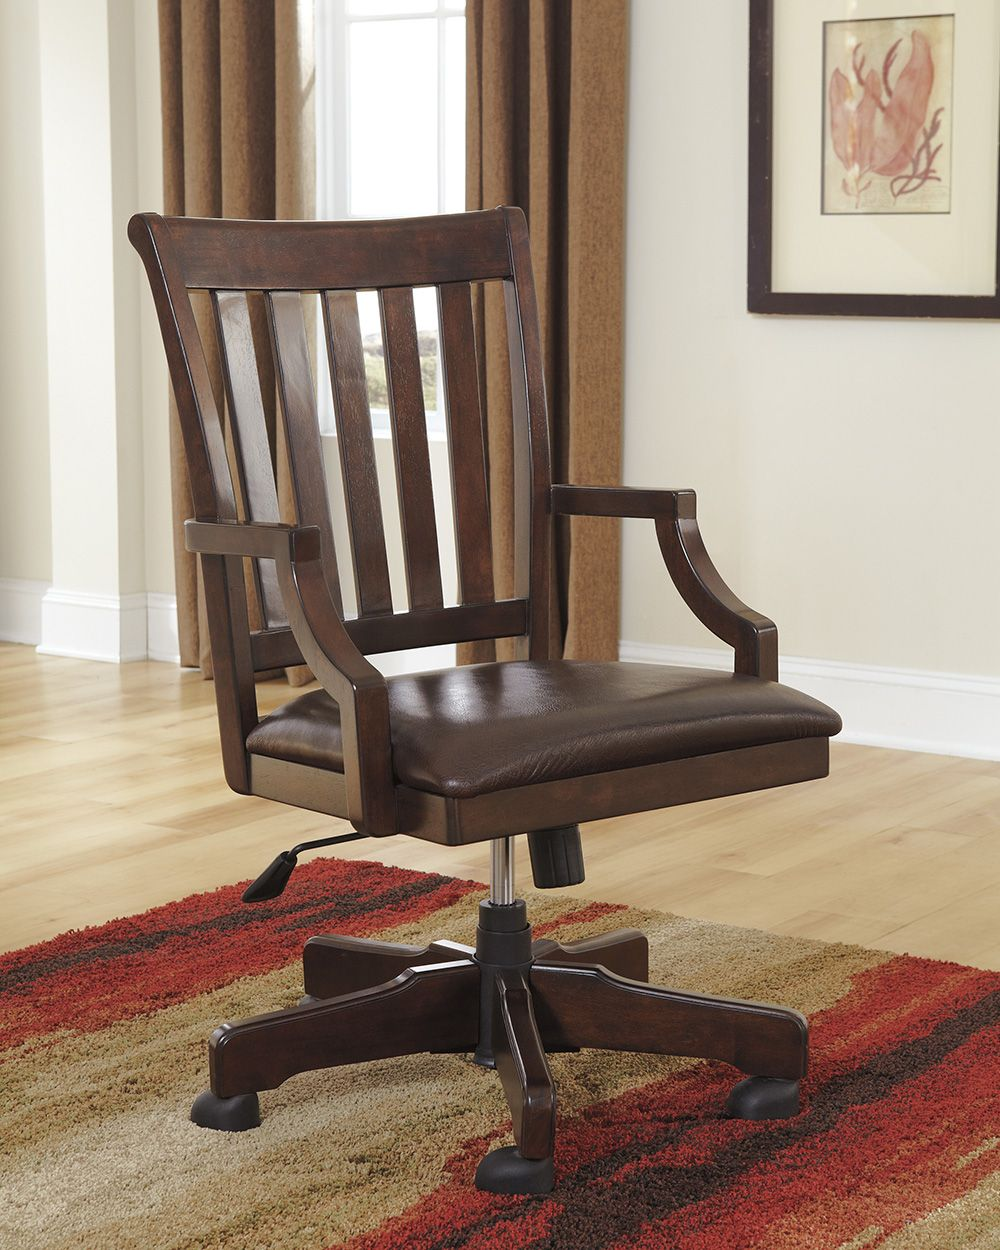 Rustikaler Schreibtisch Stuhl Ledersessel Braun